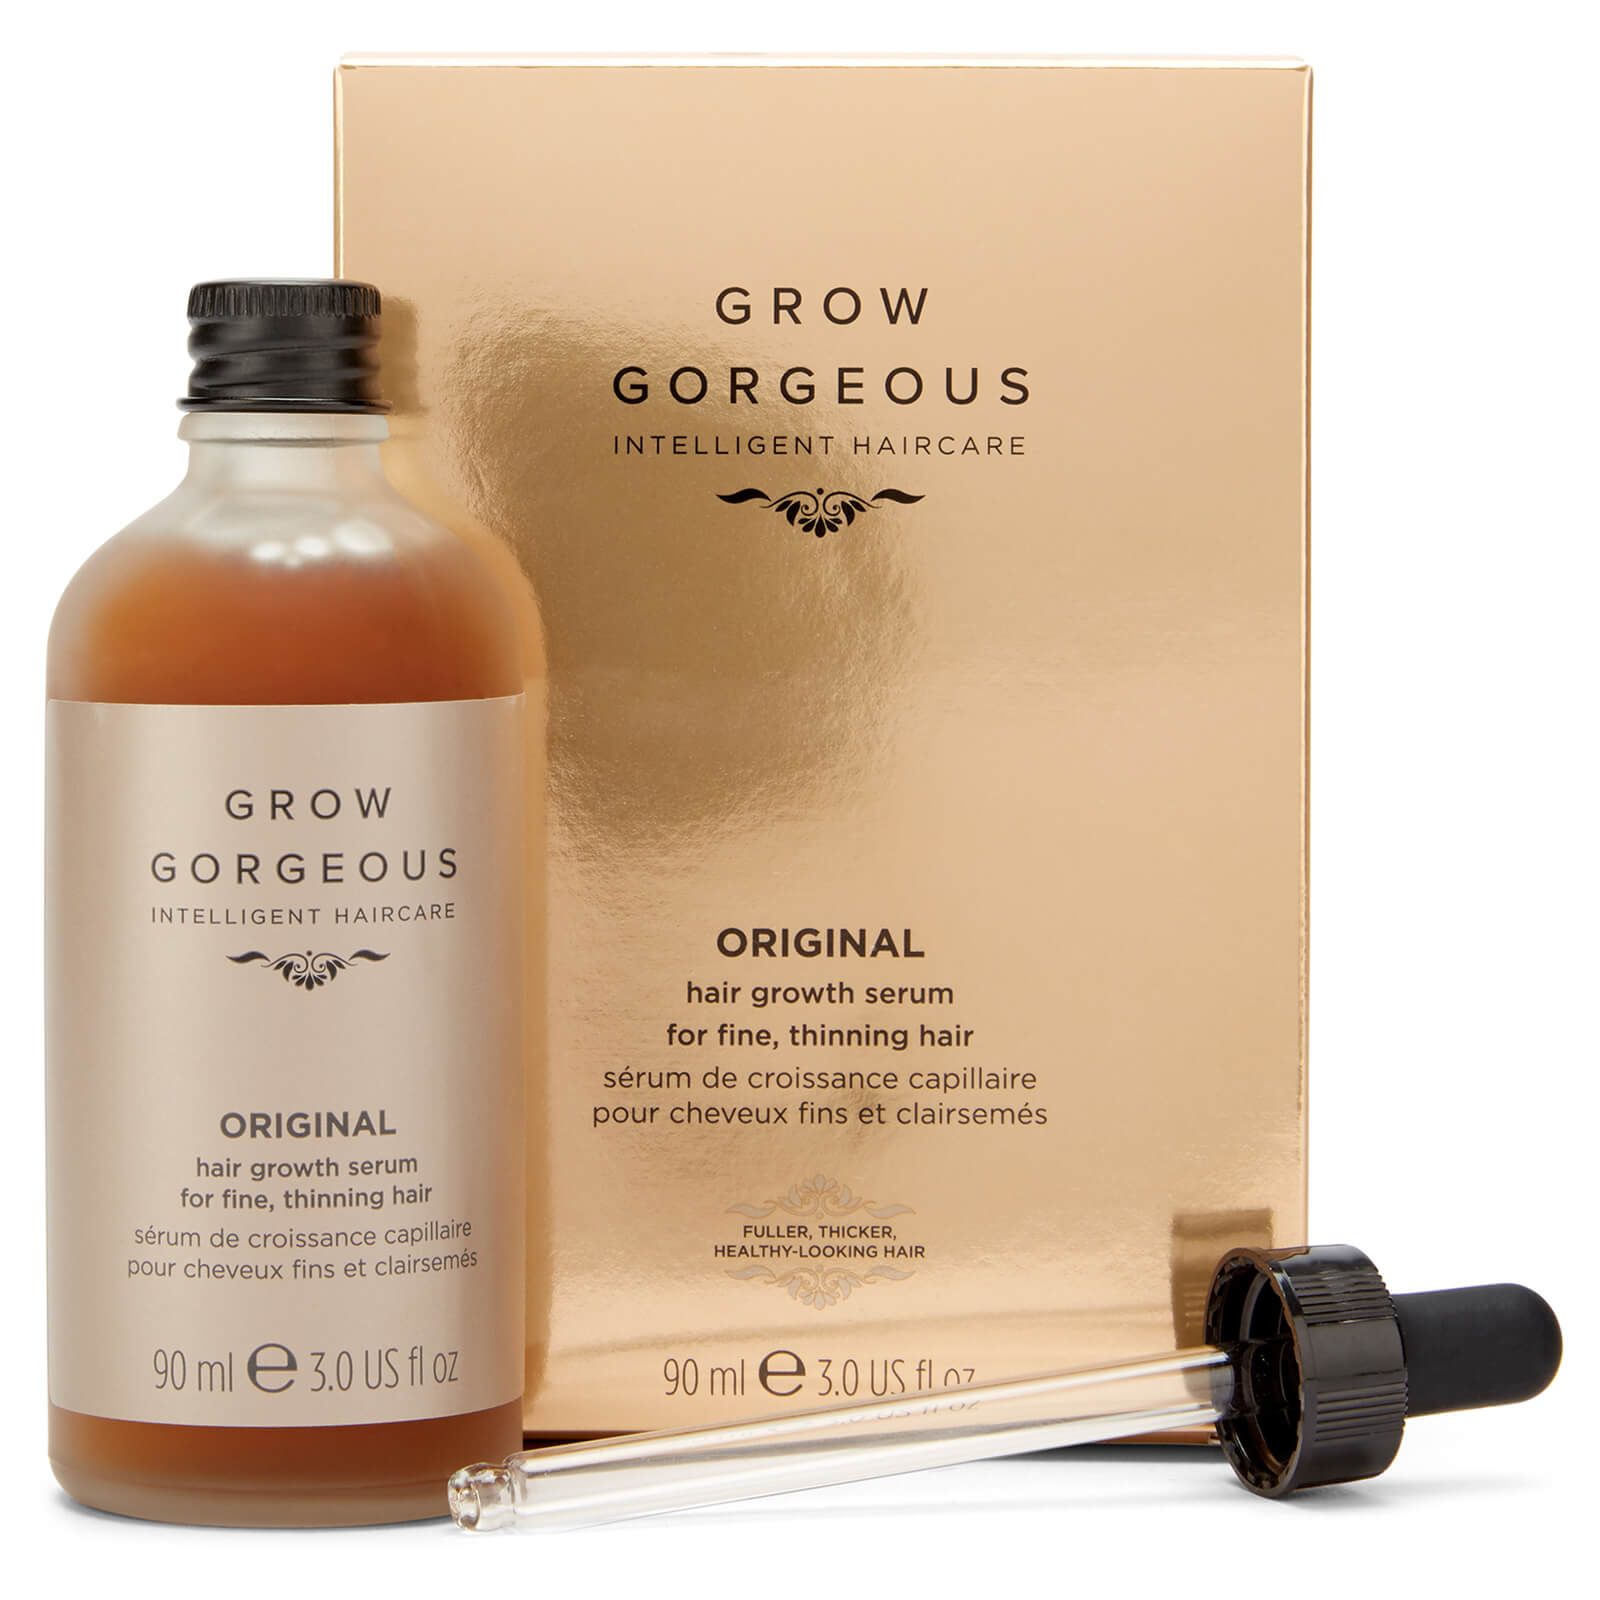 Grow Gorgeous Hair Growth Serum Original 90ml